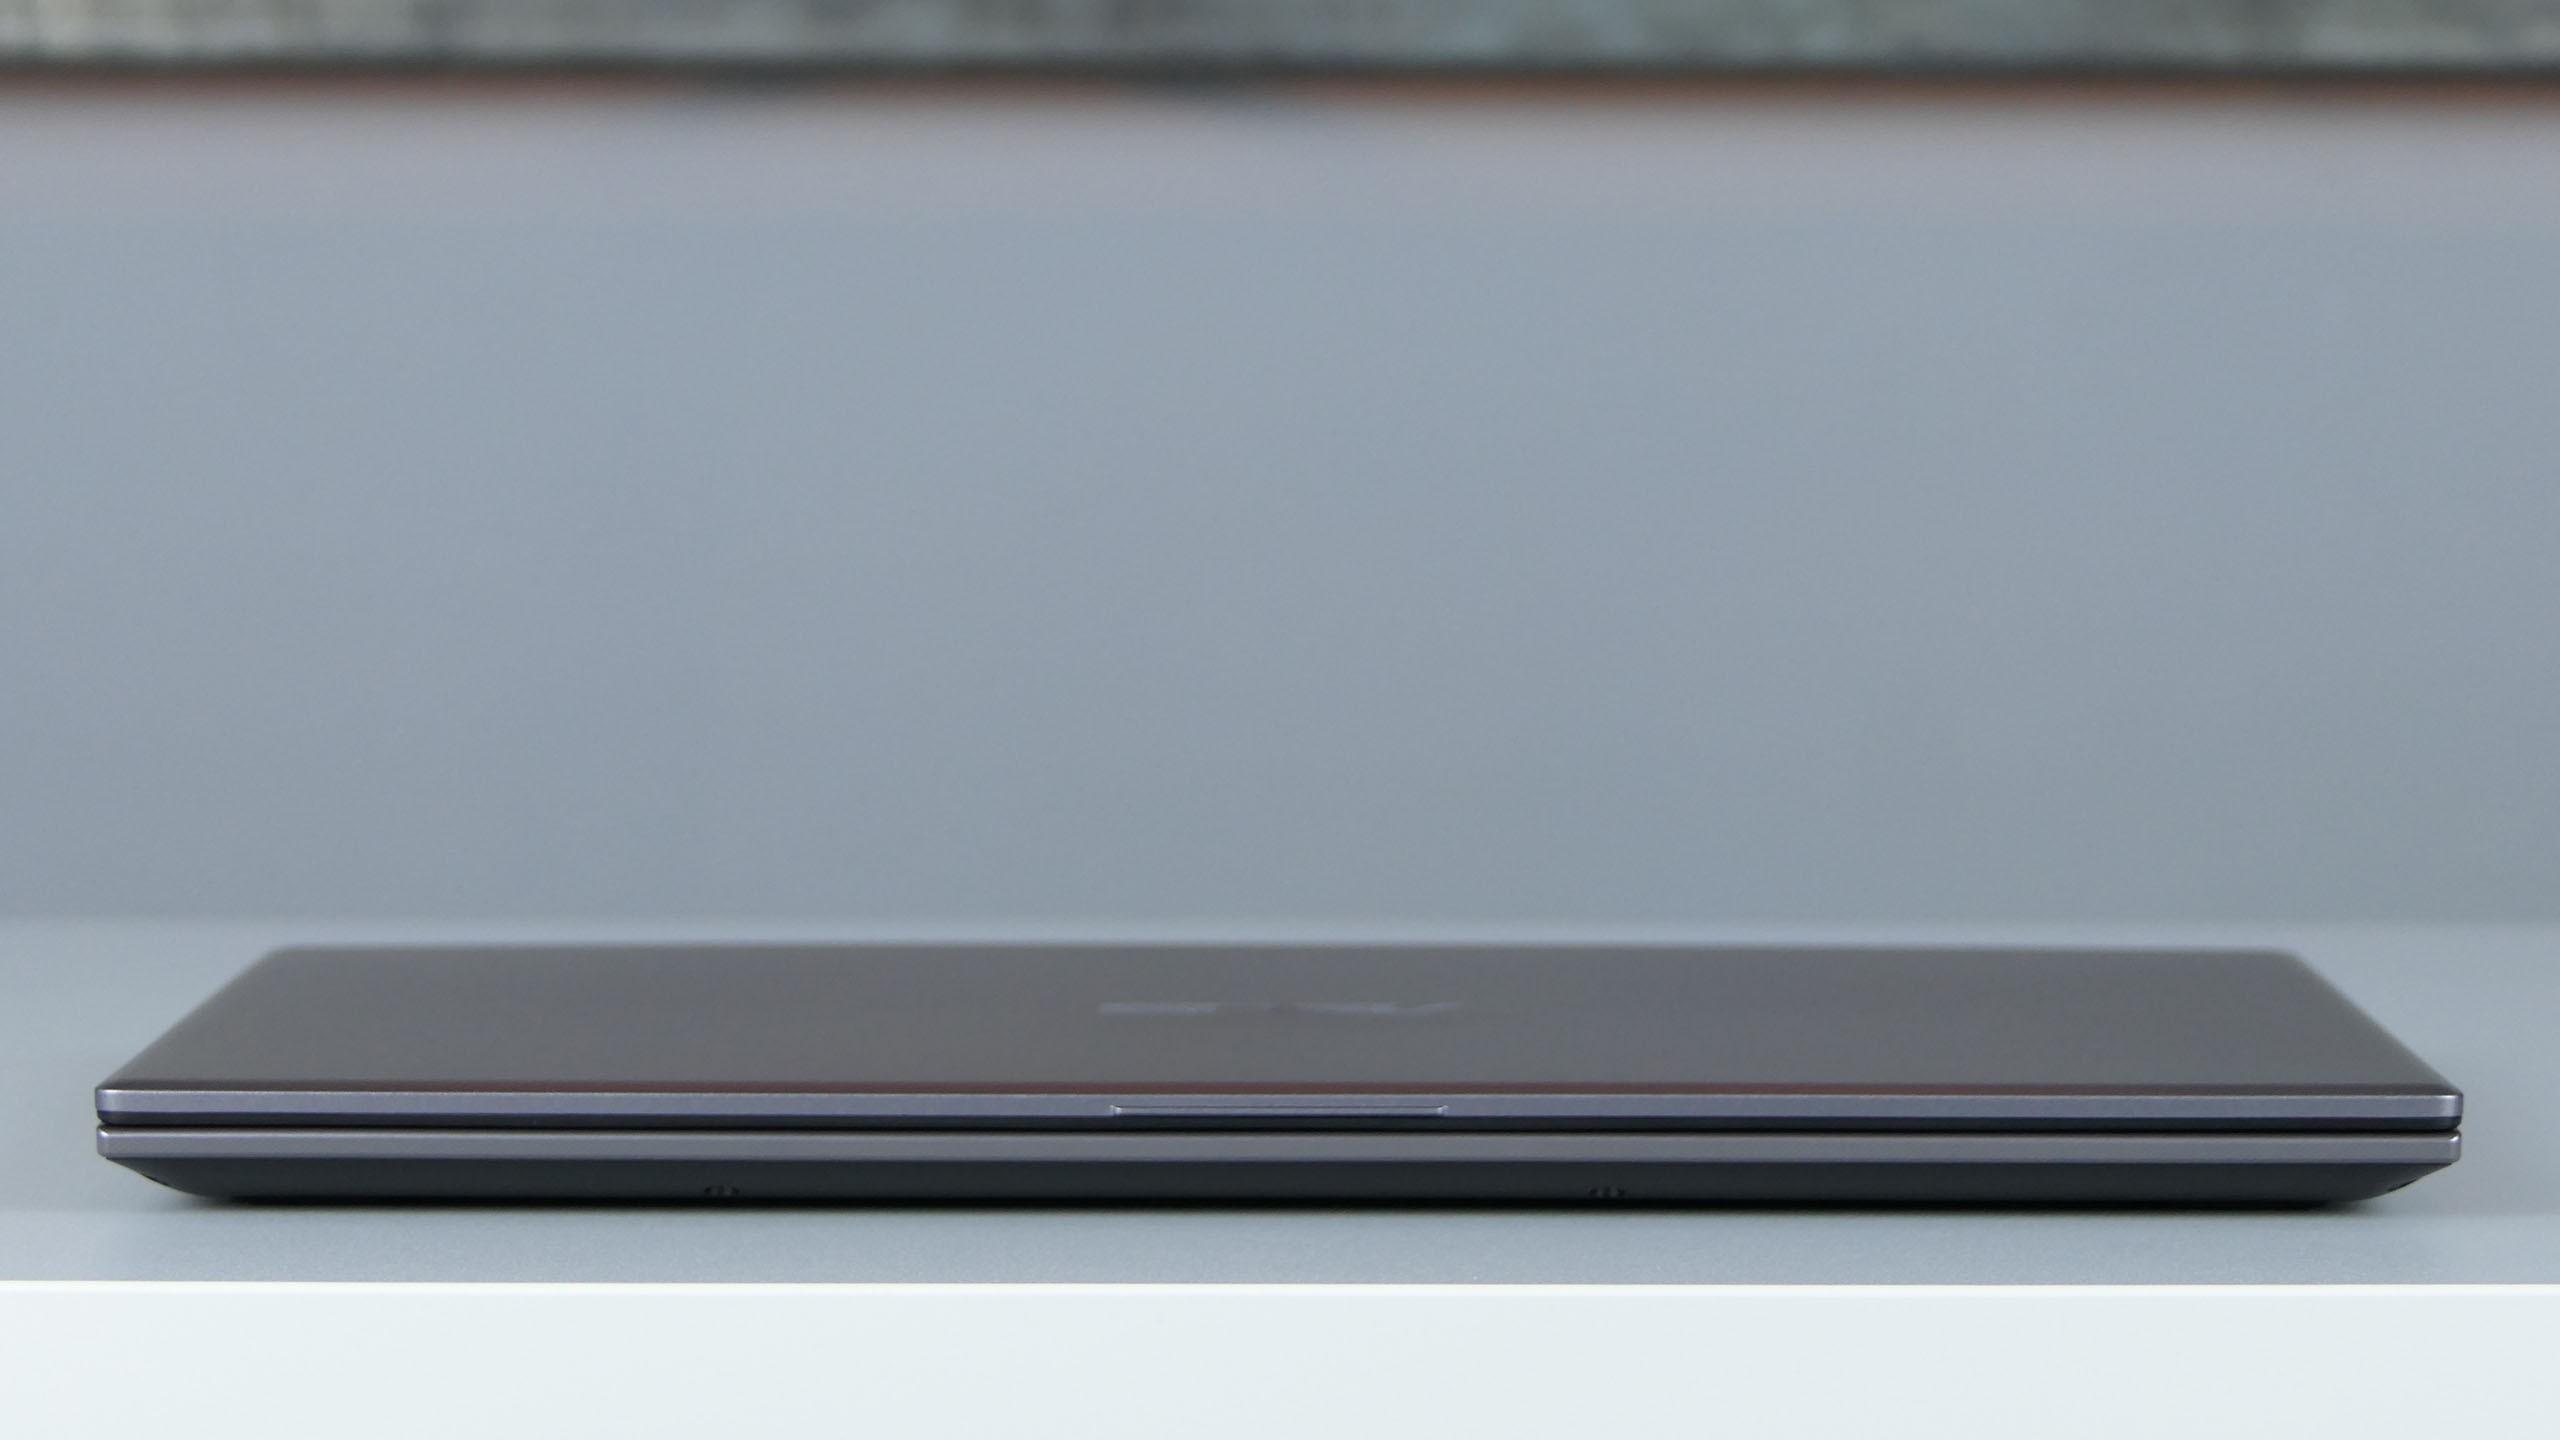 Asus VivoBook 15 X512UA / R564U - front notebooka